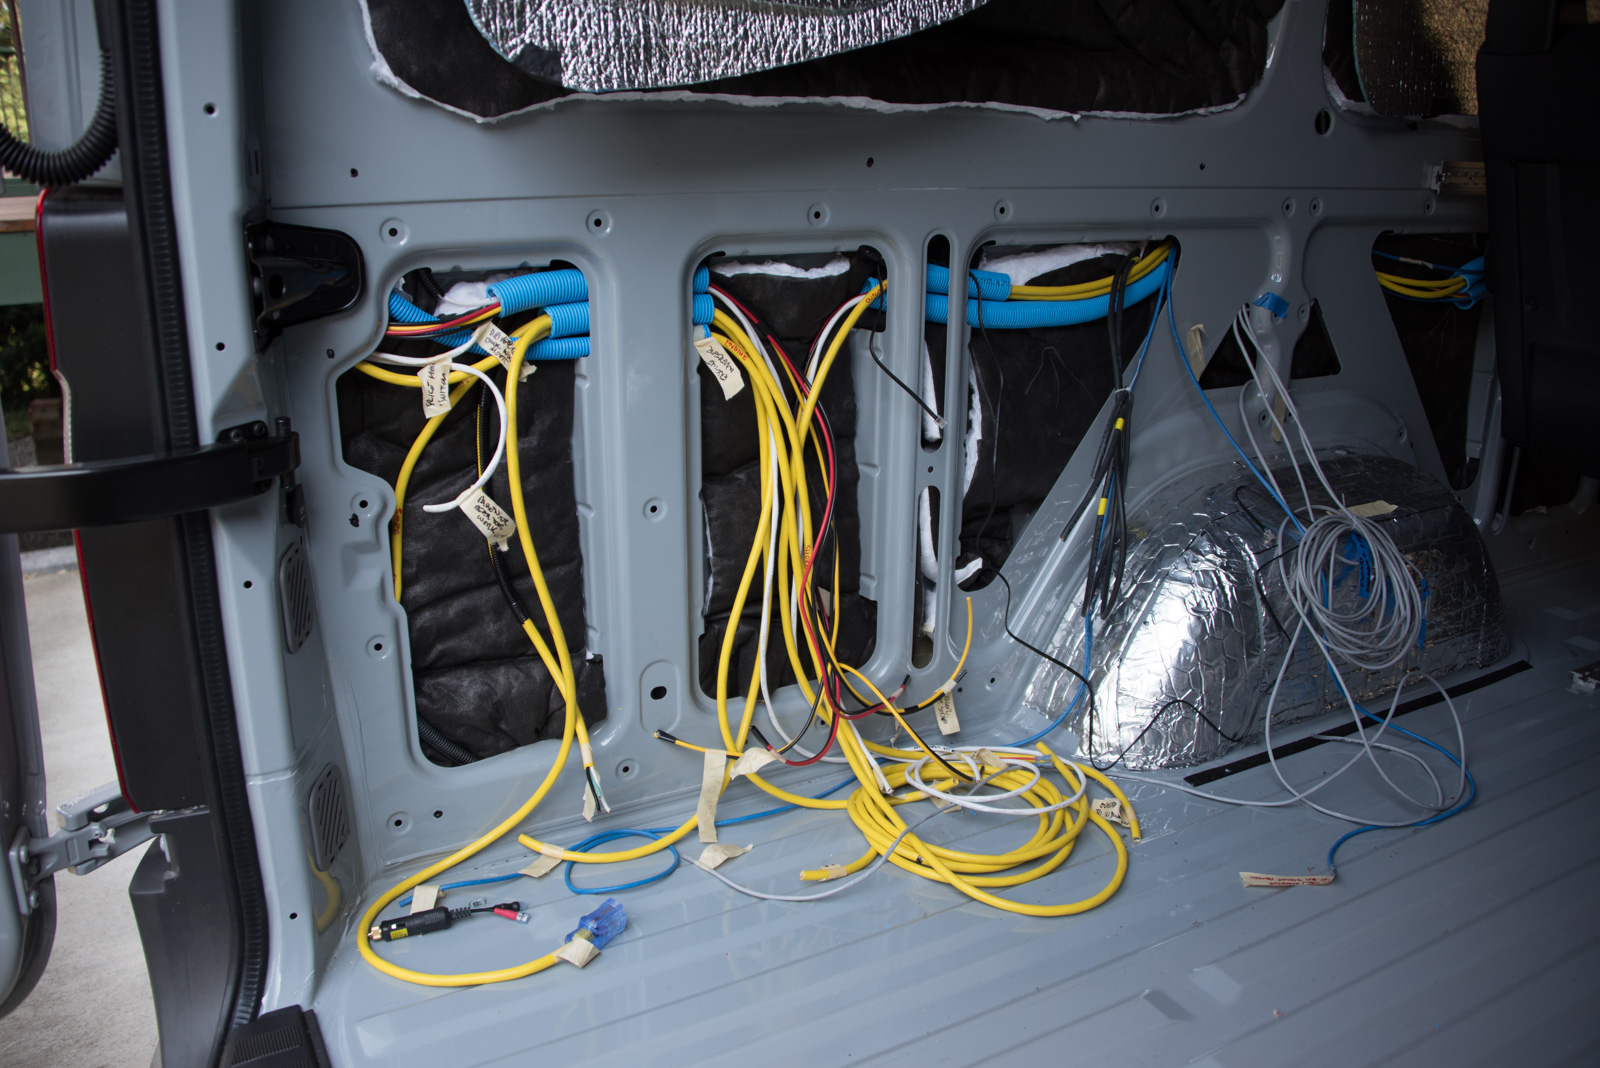 Making spaghetti - 12v and 120v cables